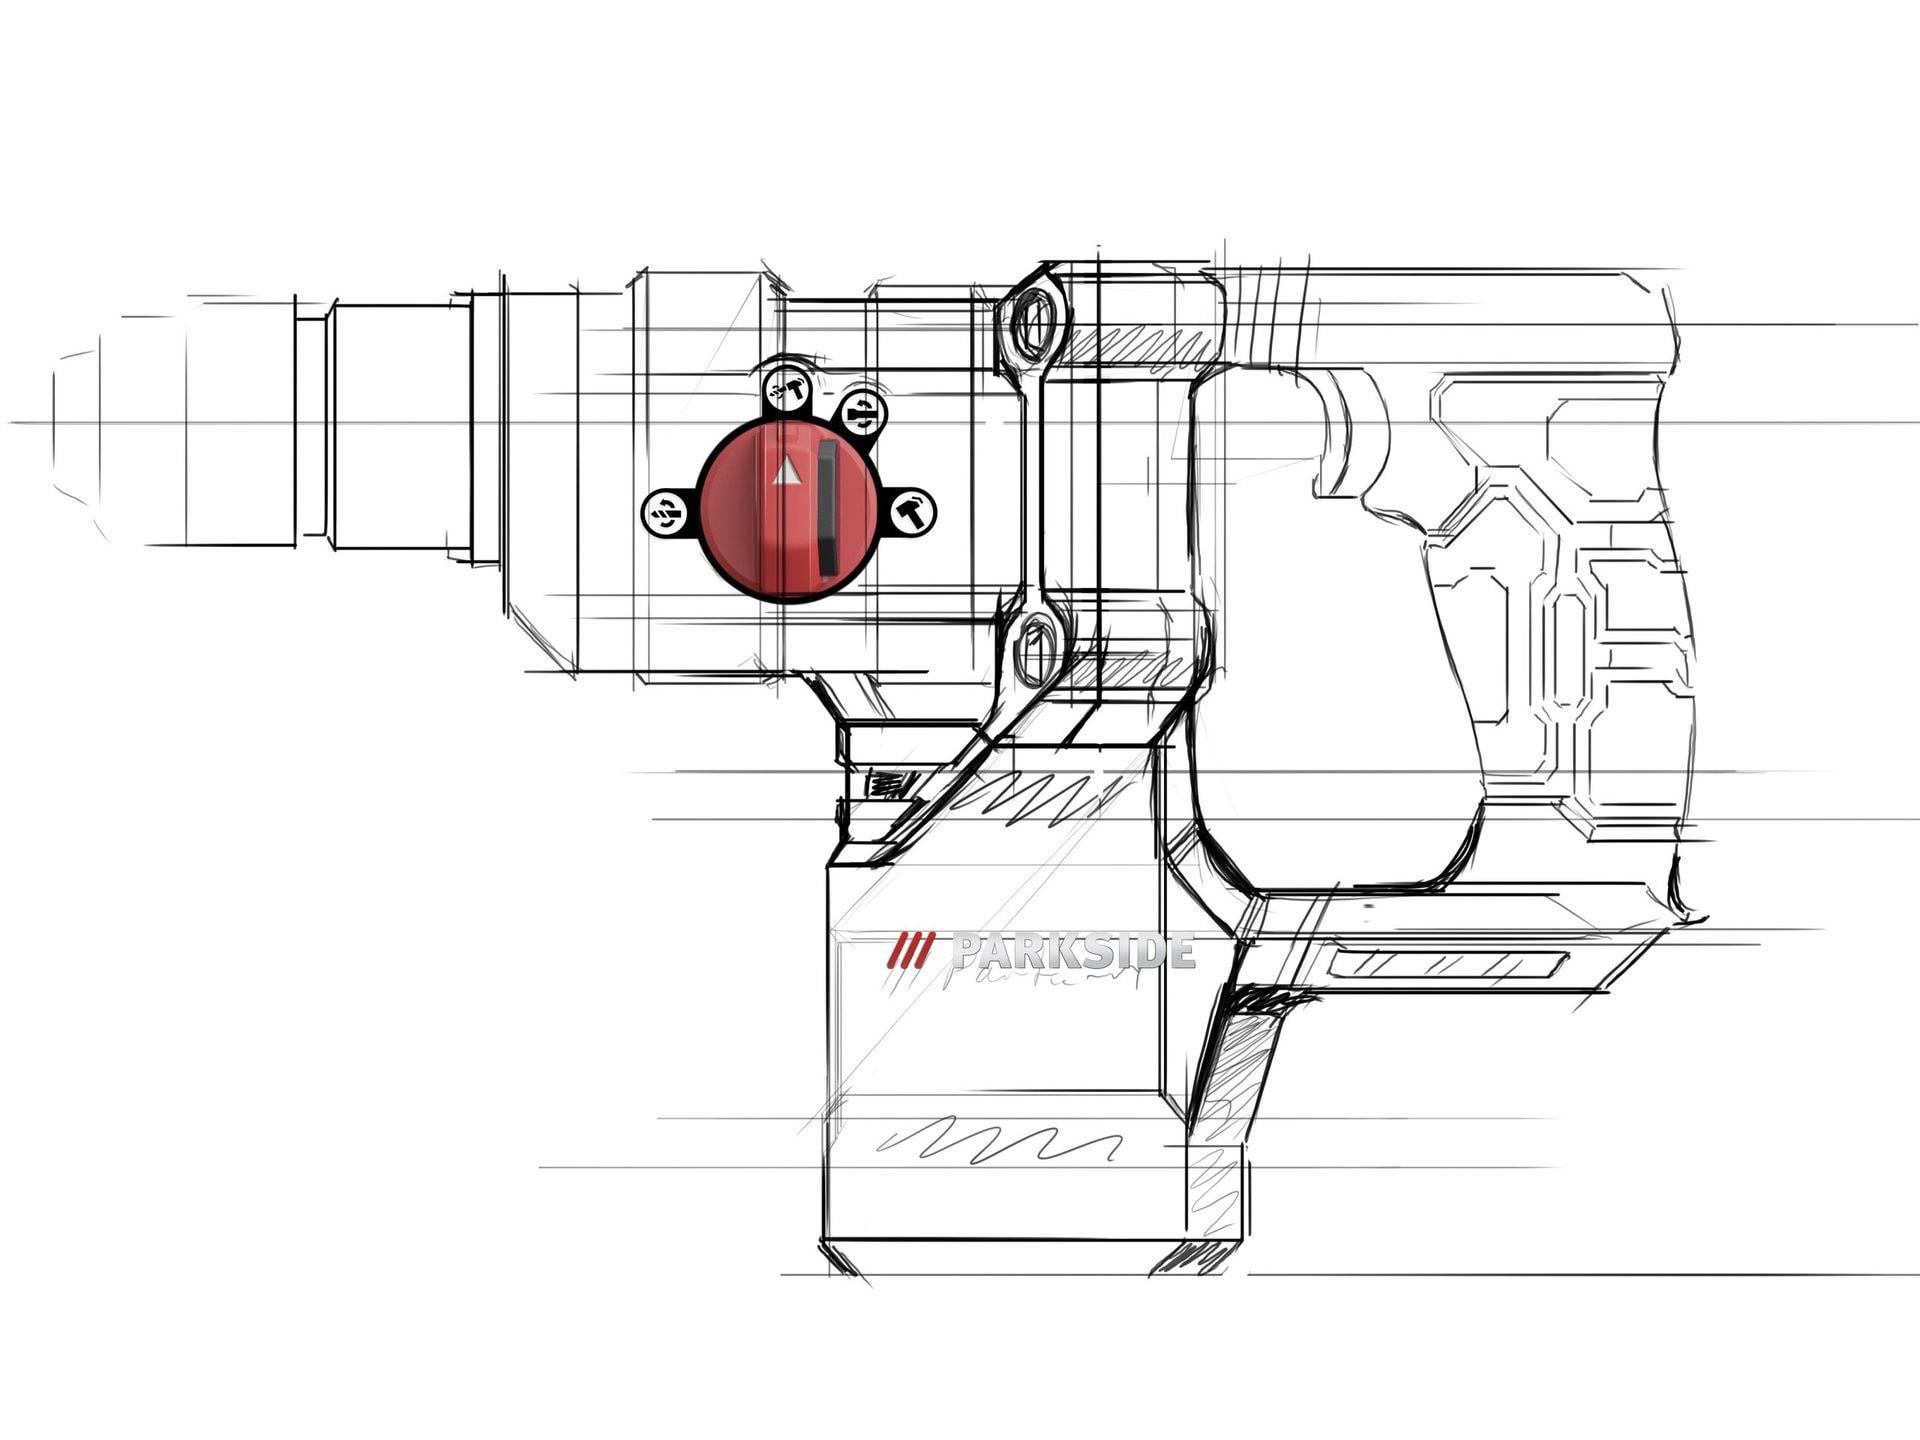 projekter_industrial_design_20V_perofrmance_hammer